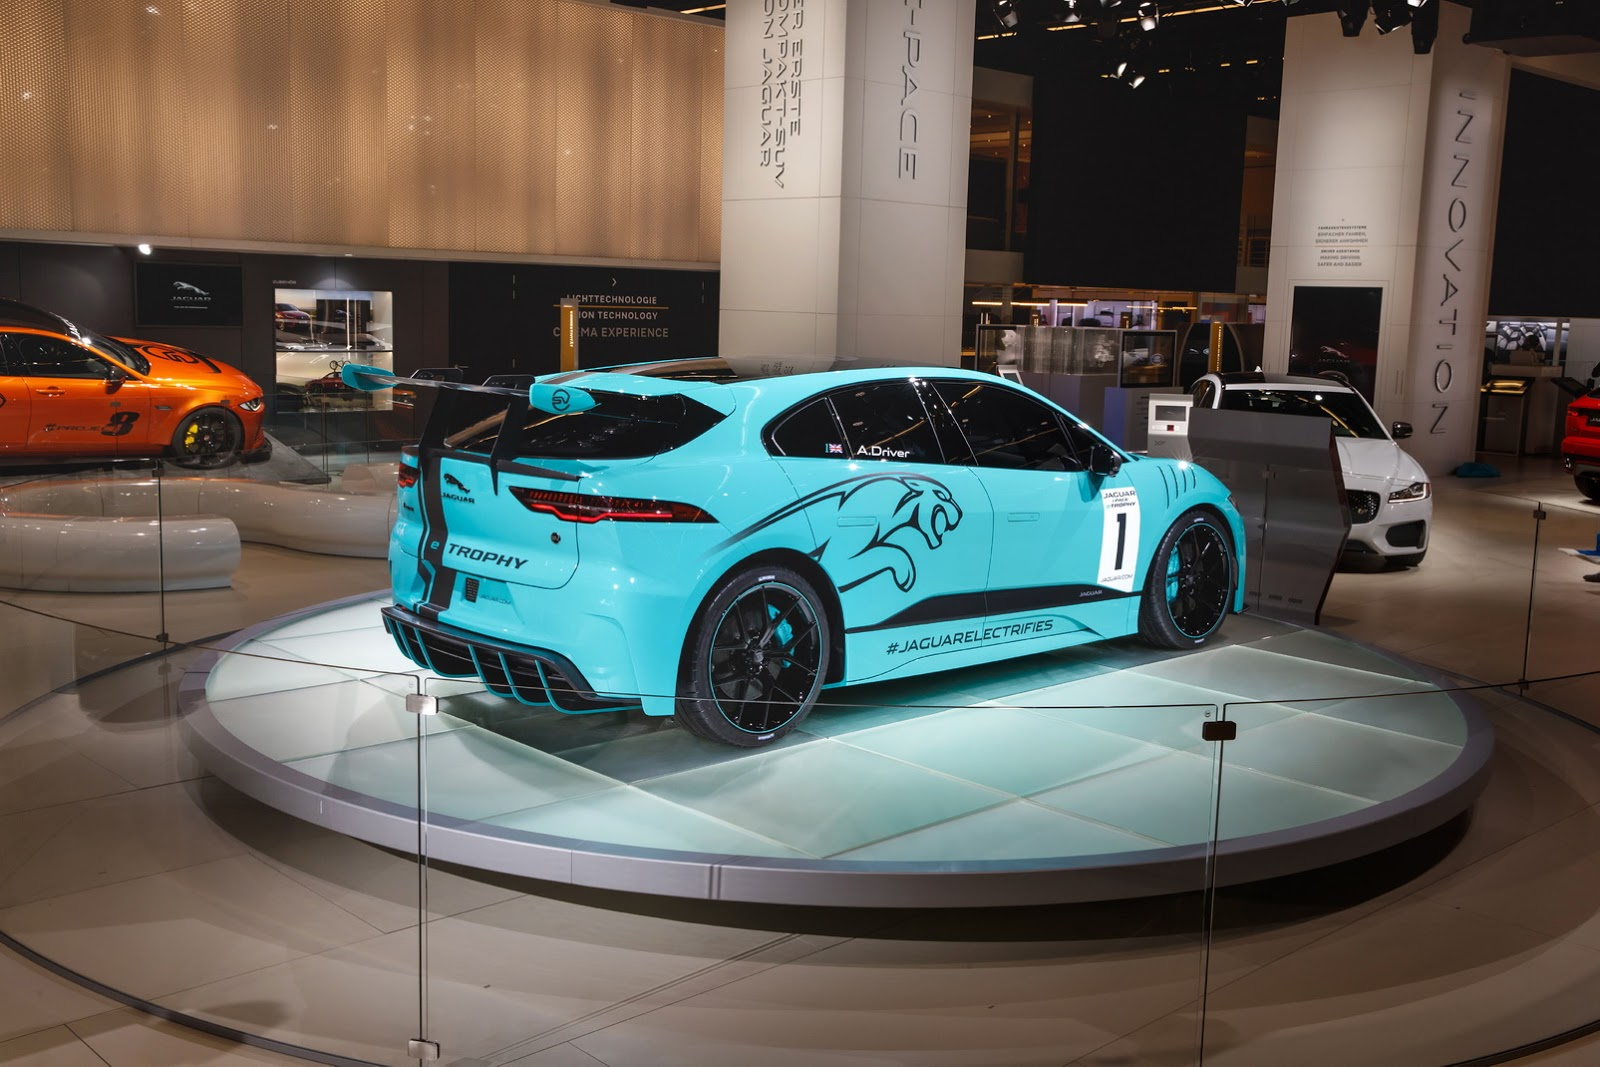 jaguar-ipace-race-car-iaa-11